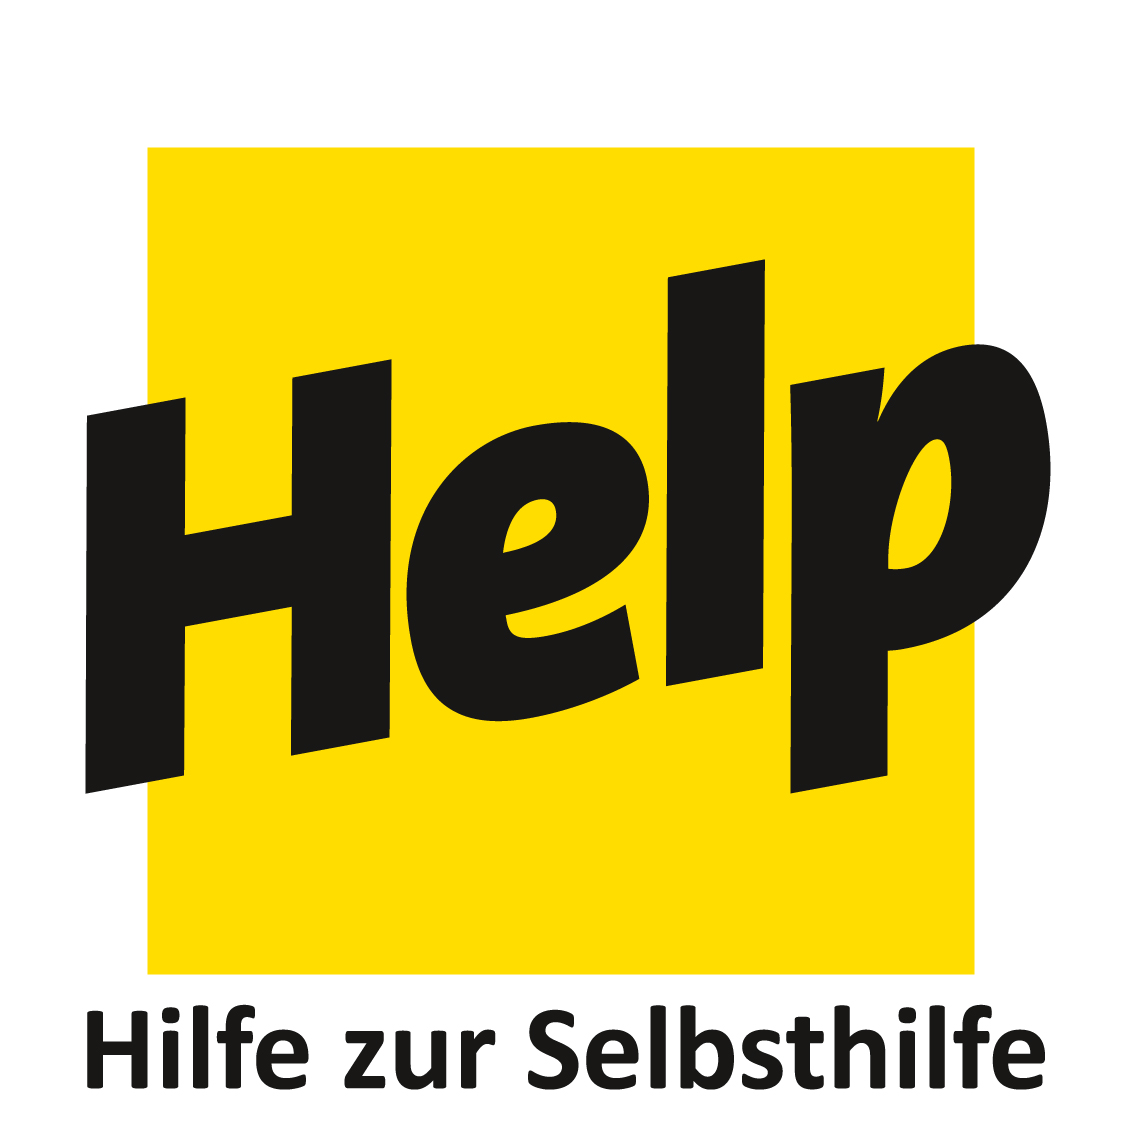 logo for Help - Hilfe zur Selbsthilfe